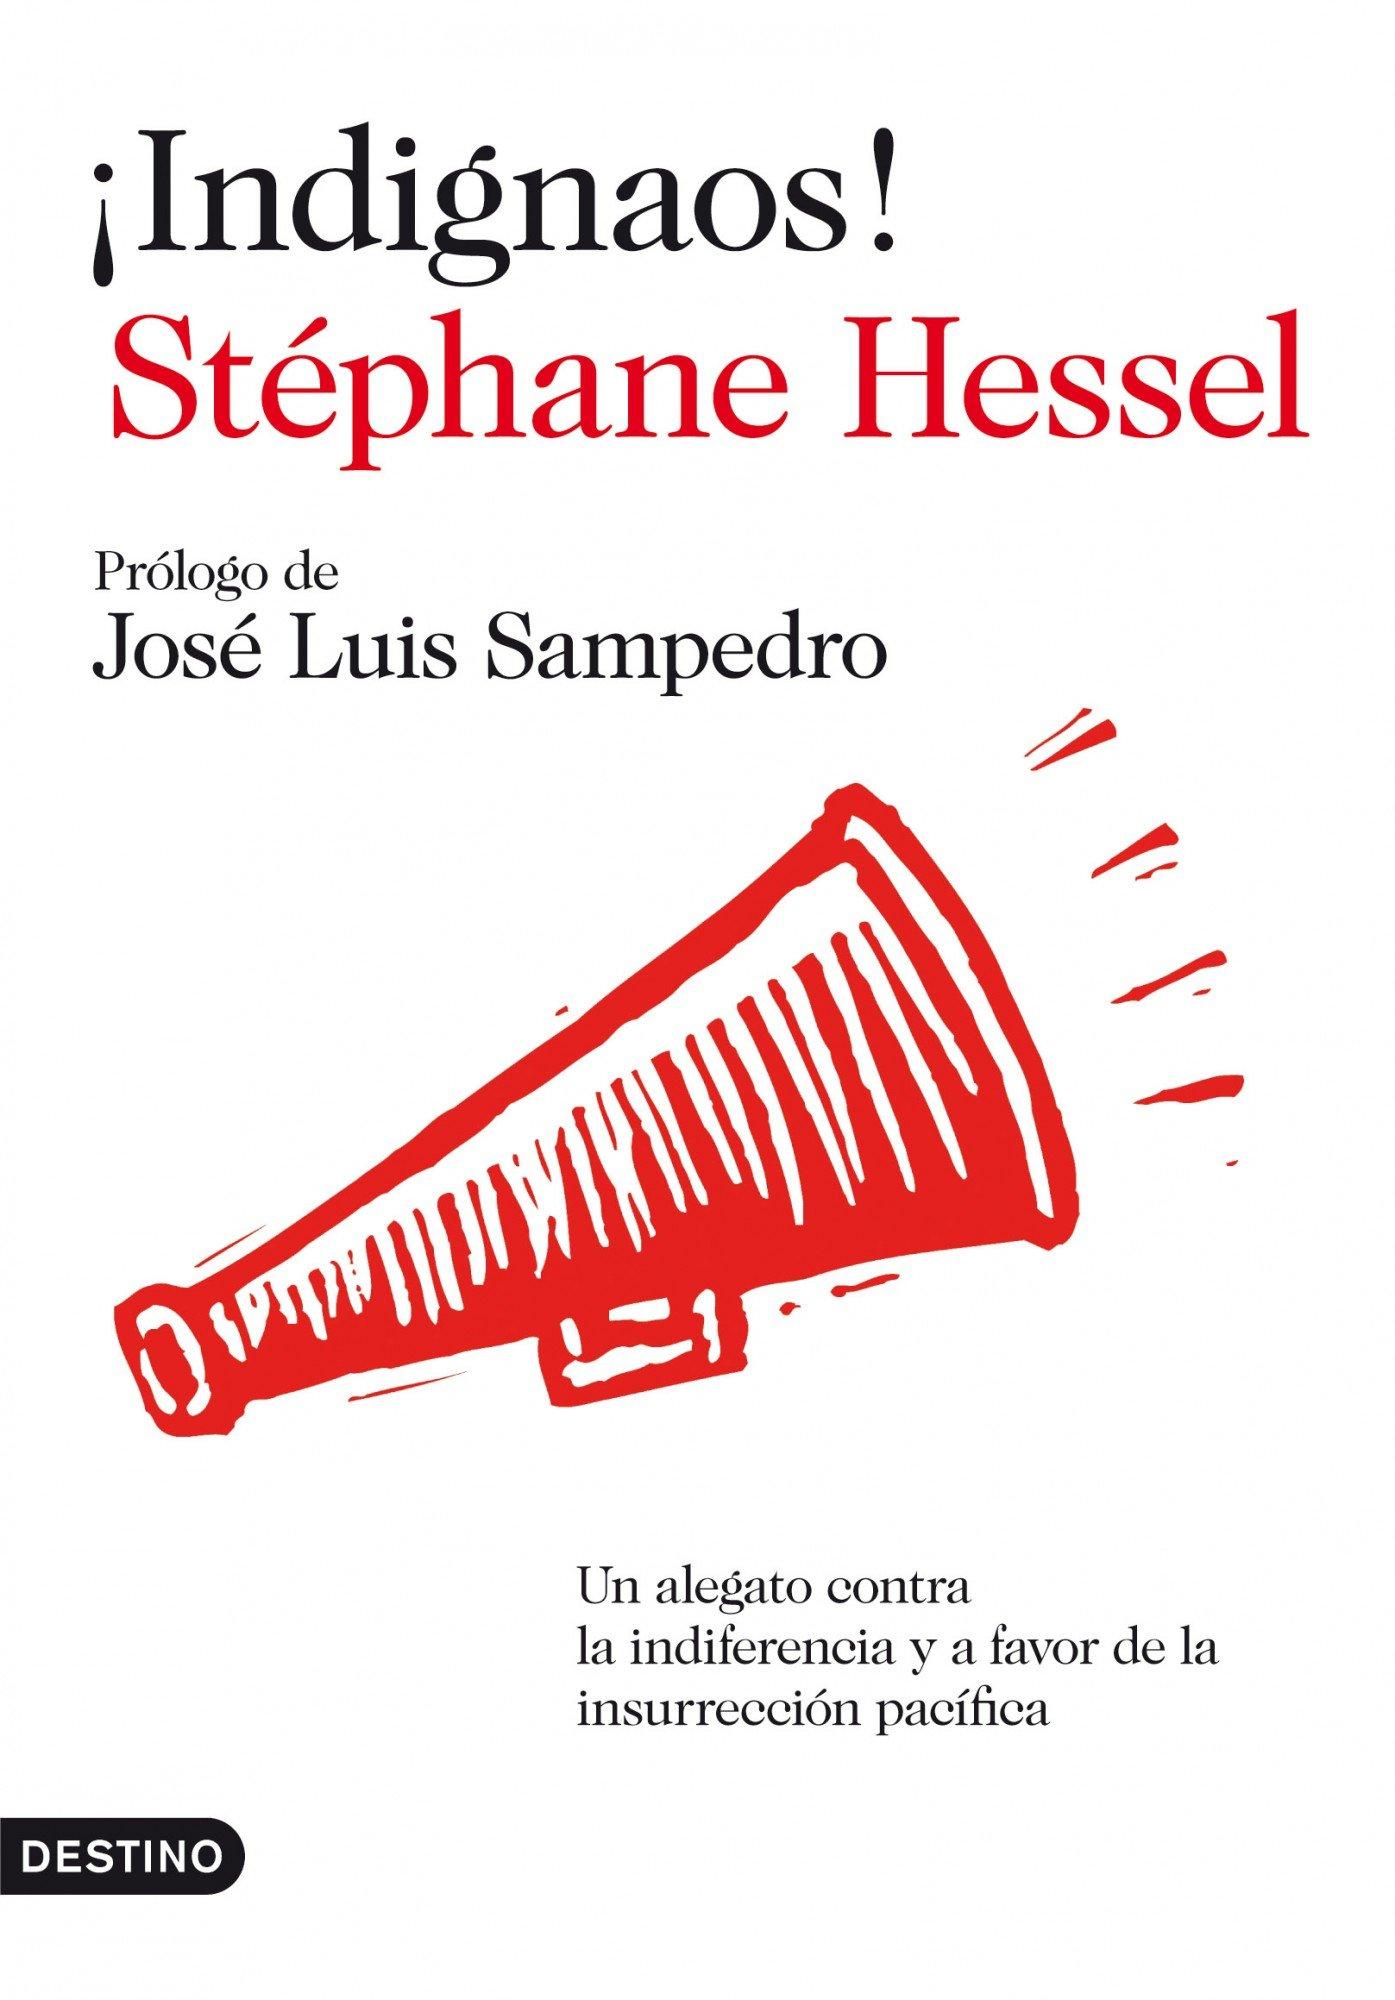 Resultado de imagen de stephen hessel